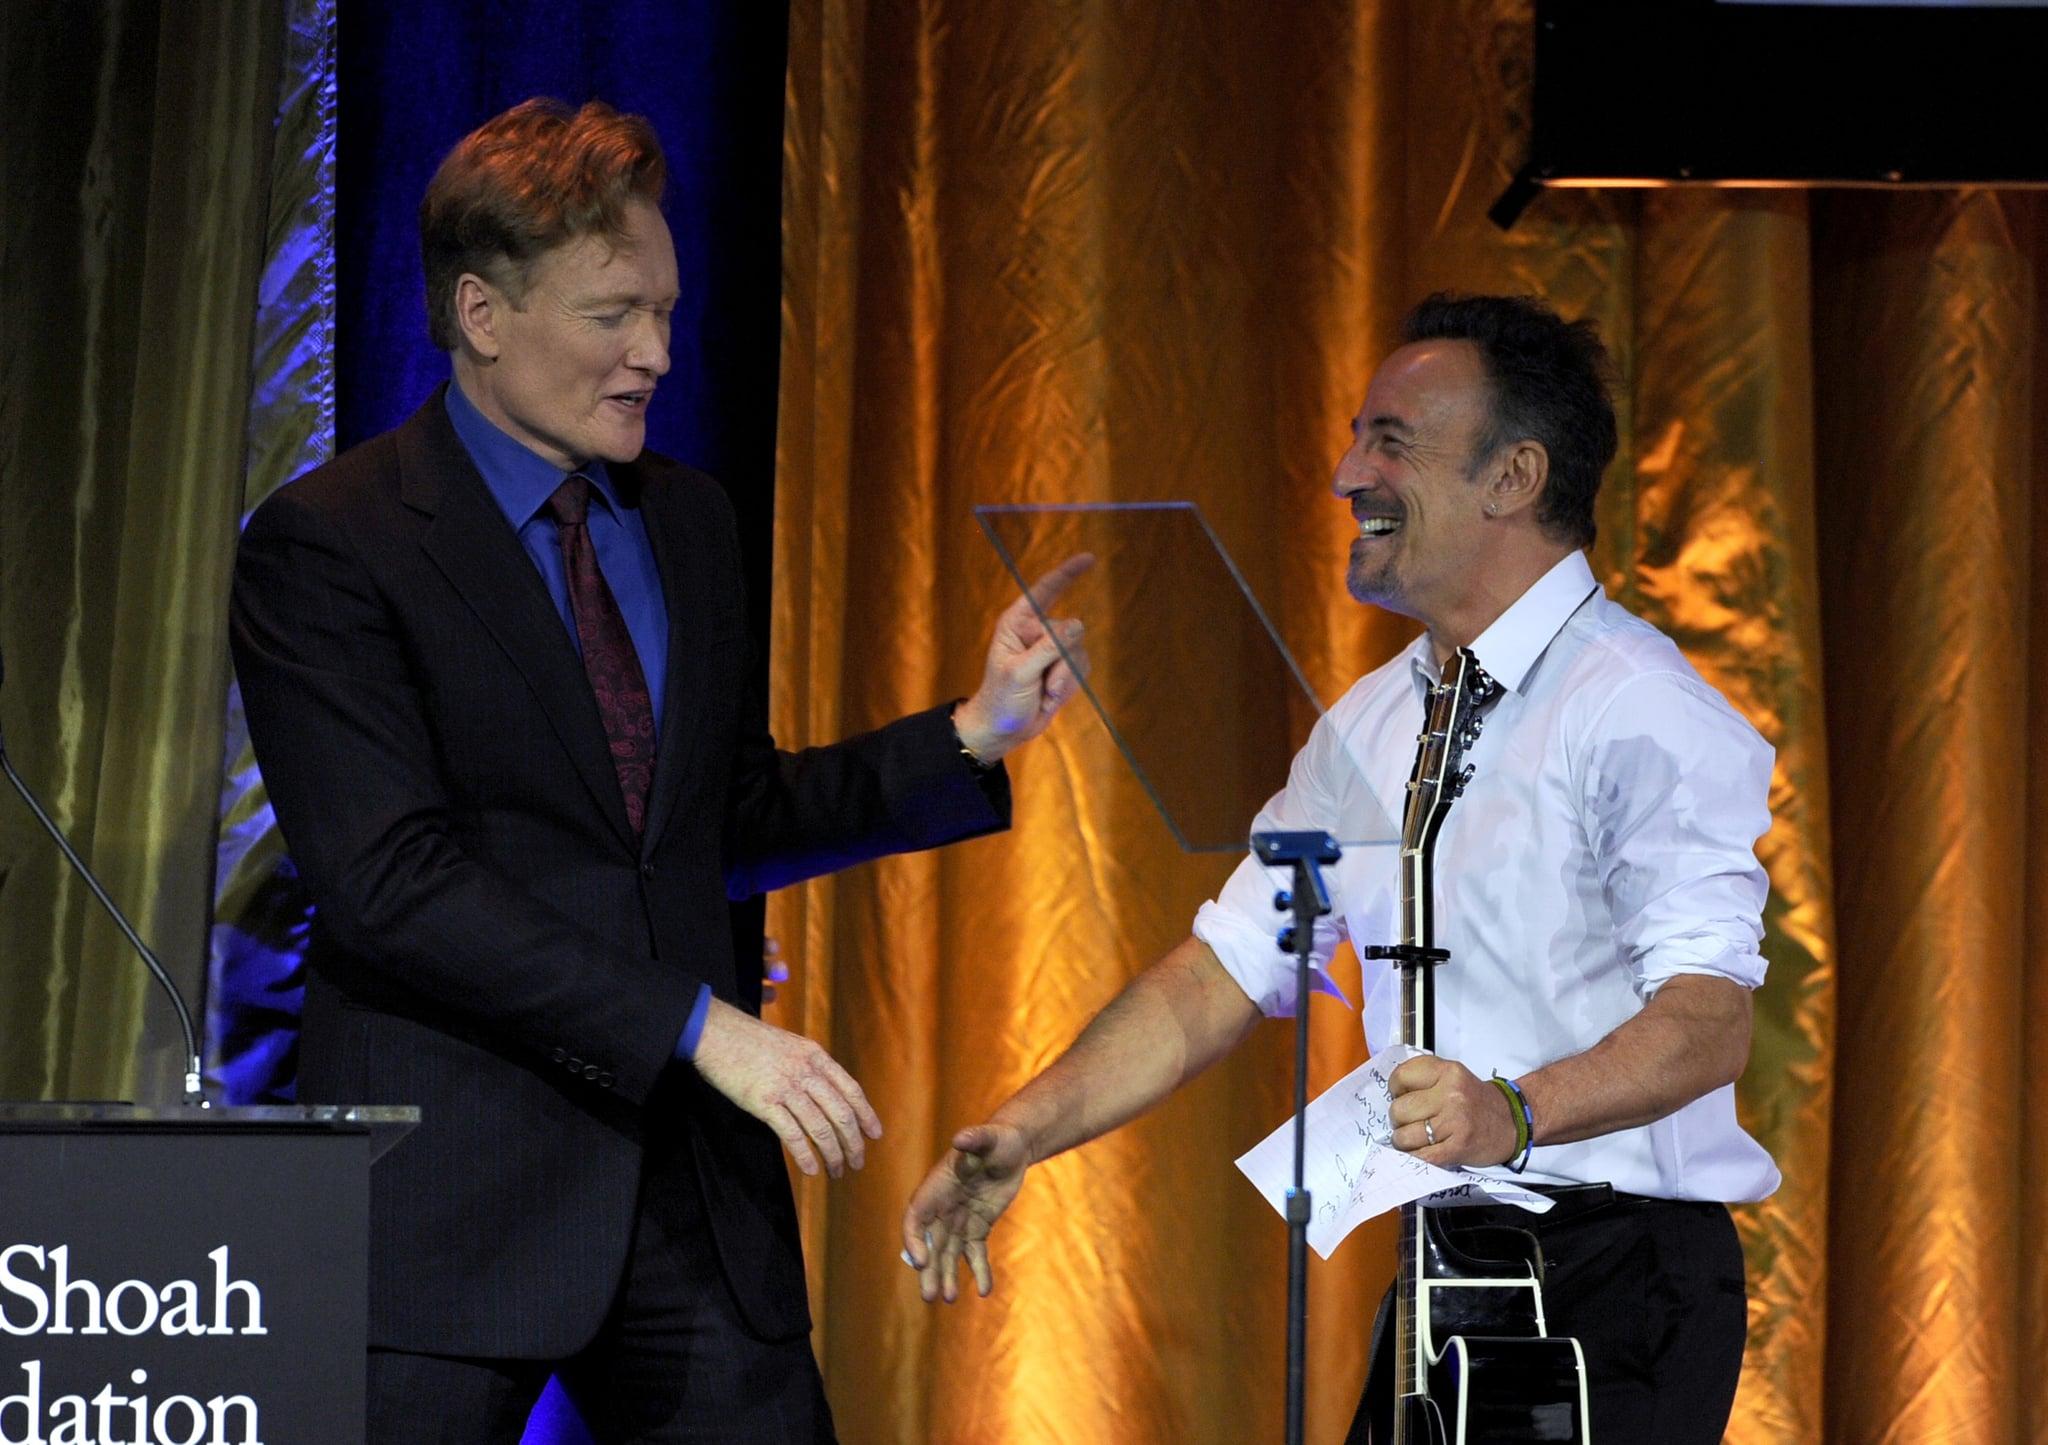 Conan O'Brien shook hands with Bruce Springsteen.